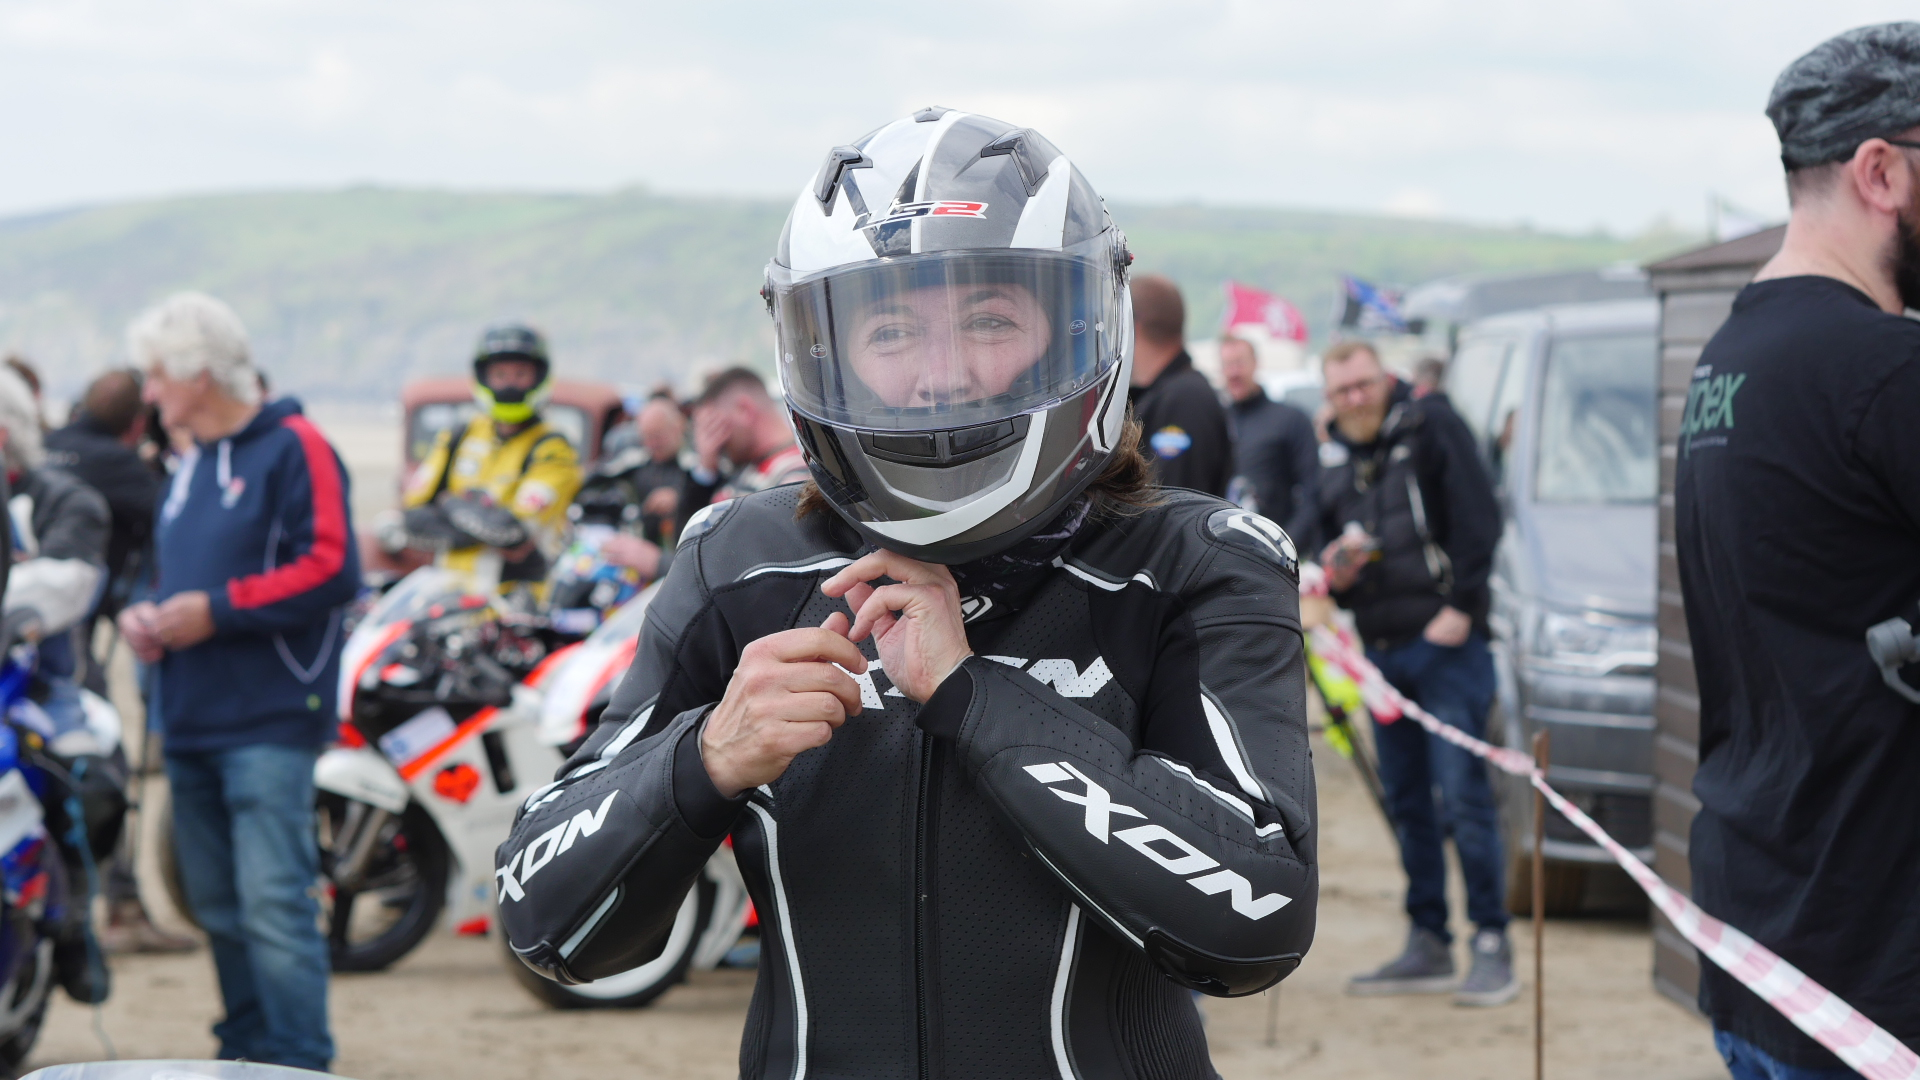 Louisa-Swaden-Adventure-Rider-Radio-Motorcycle-Podcast-8.JPG